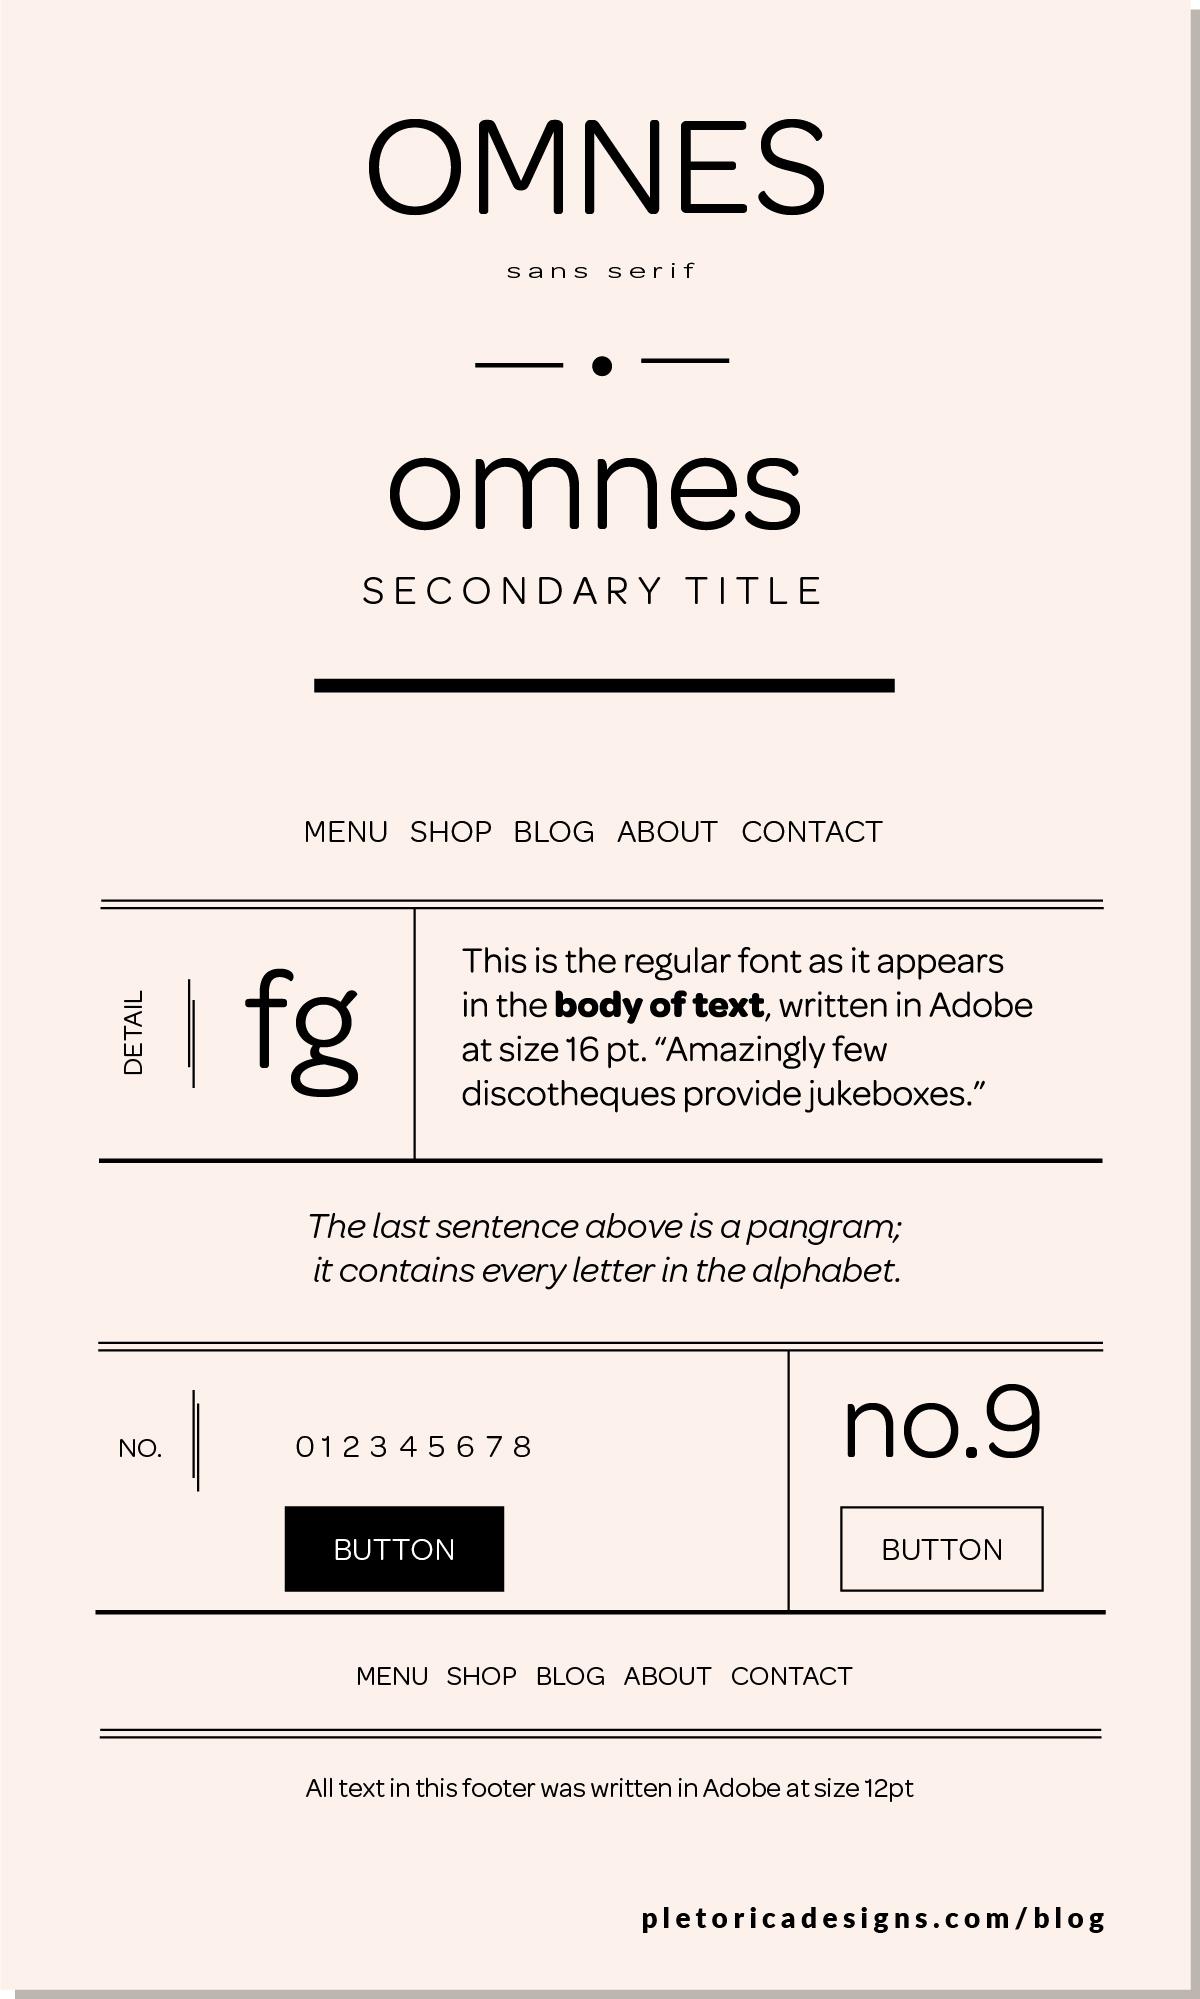 LET'S TYPE: Omnes — PLETÓRICA DESIGNS